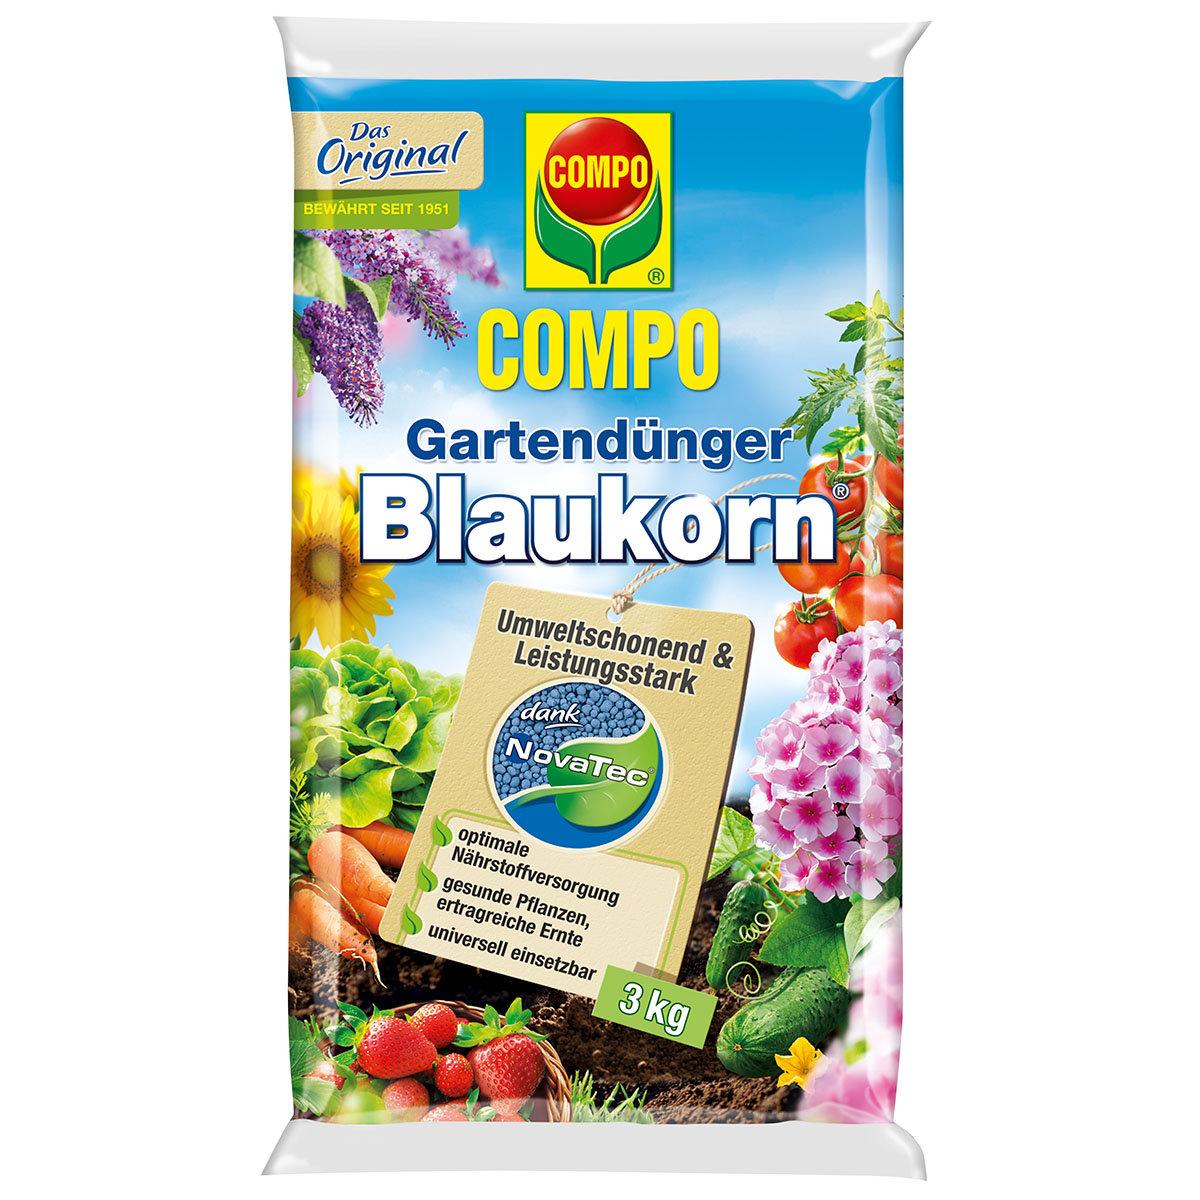 Gartendünger Nova Tec, 3 kg